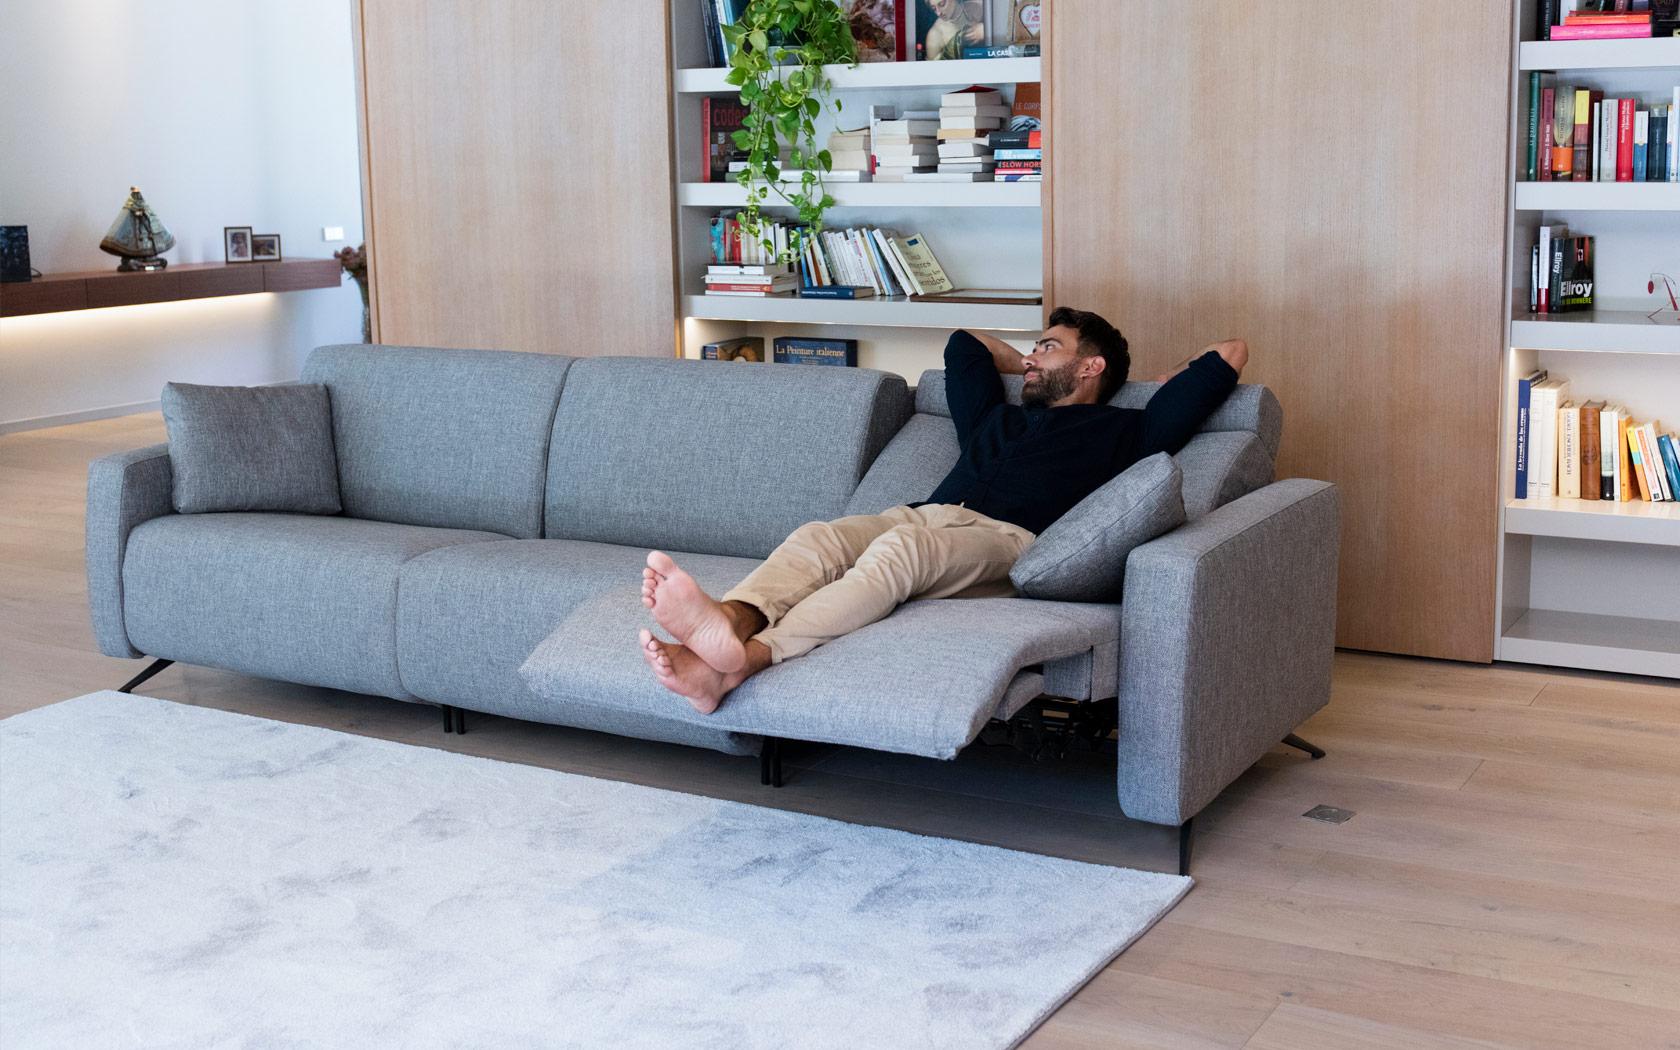 Atlanta sofa relax 2020 10